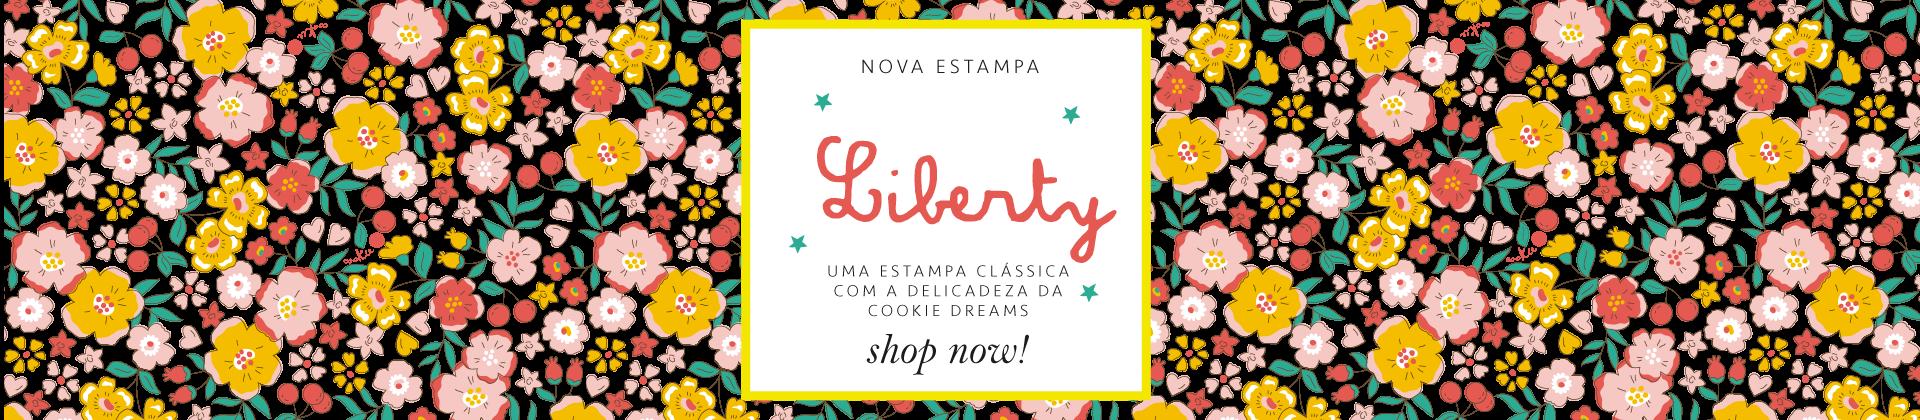 Estampa Liberty Cookie Dreams Pijamas Algodão Pima Peruano Infantil